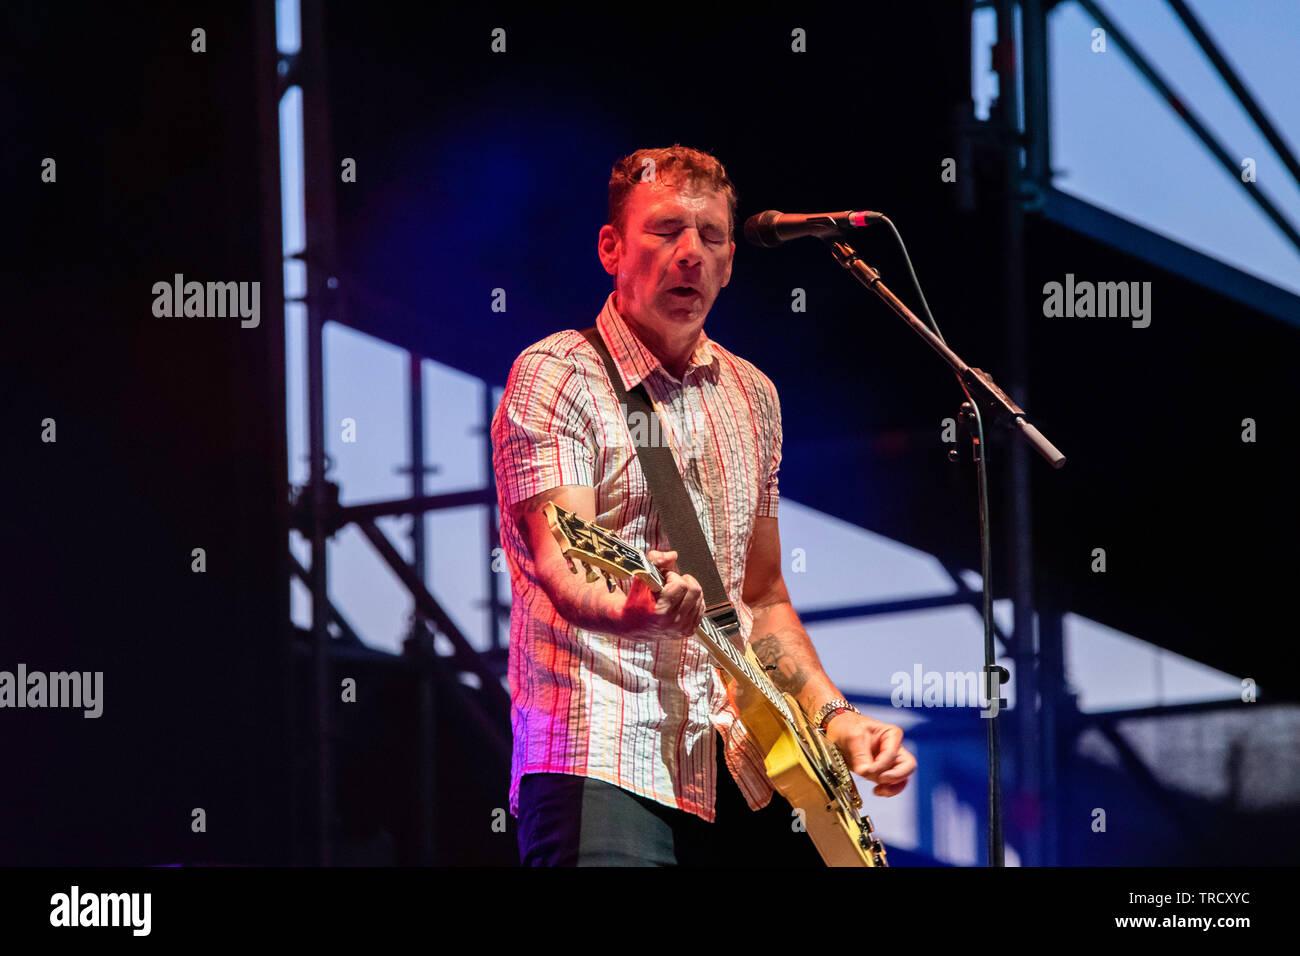 Jawbreaker at Primavera Sound 2019 - Stock Image